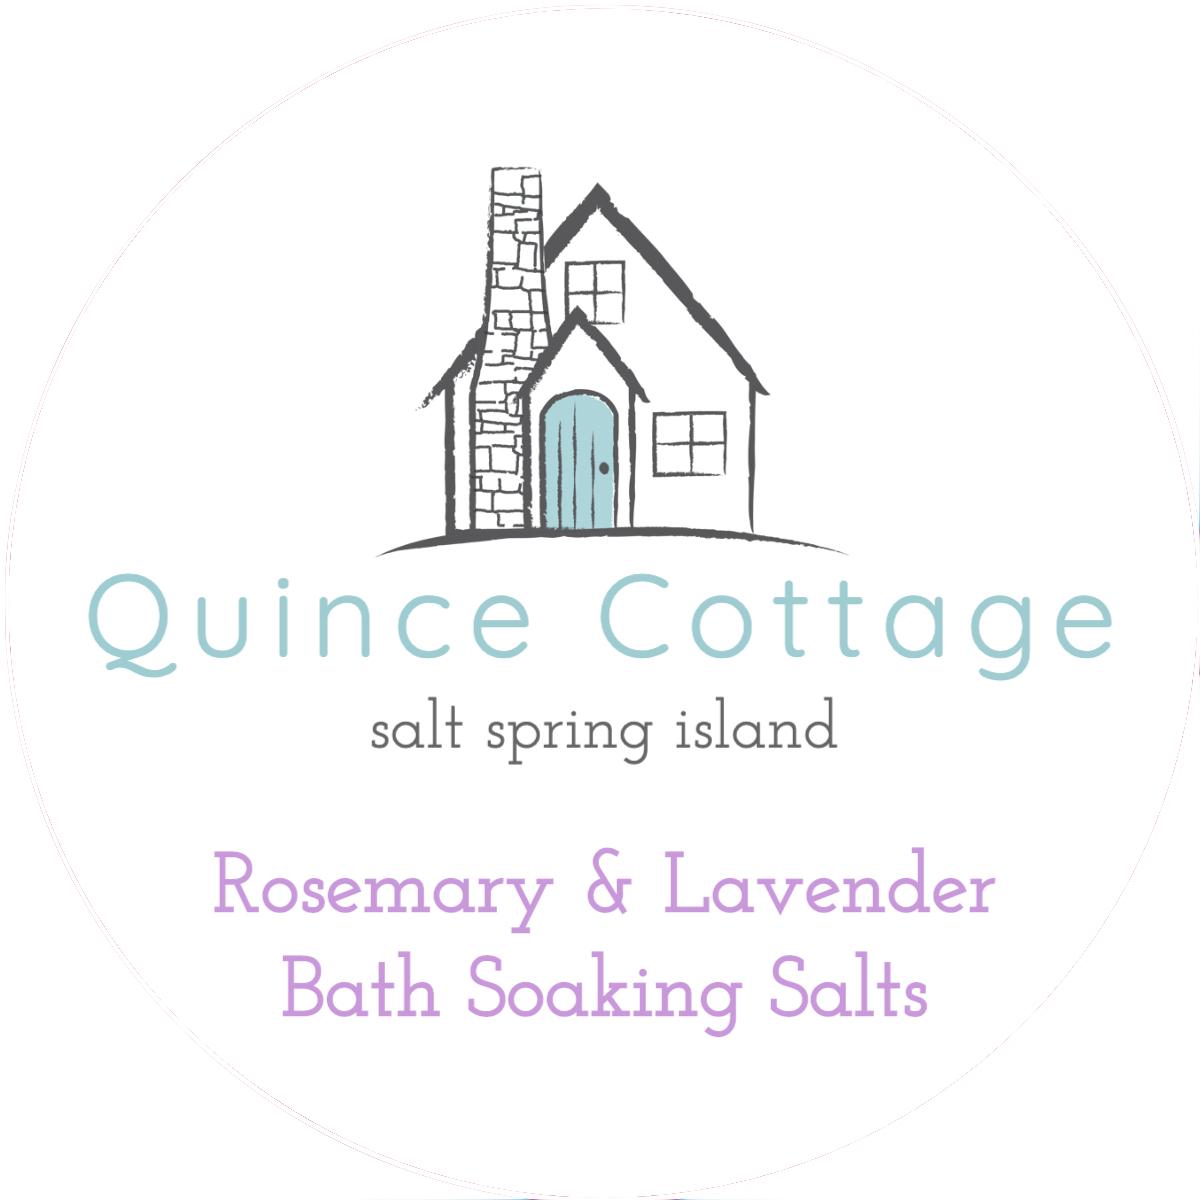 Rosemary & Lavender Bath Soaking Salts Label